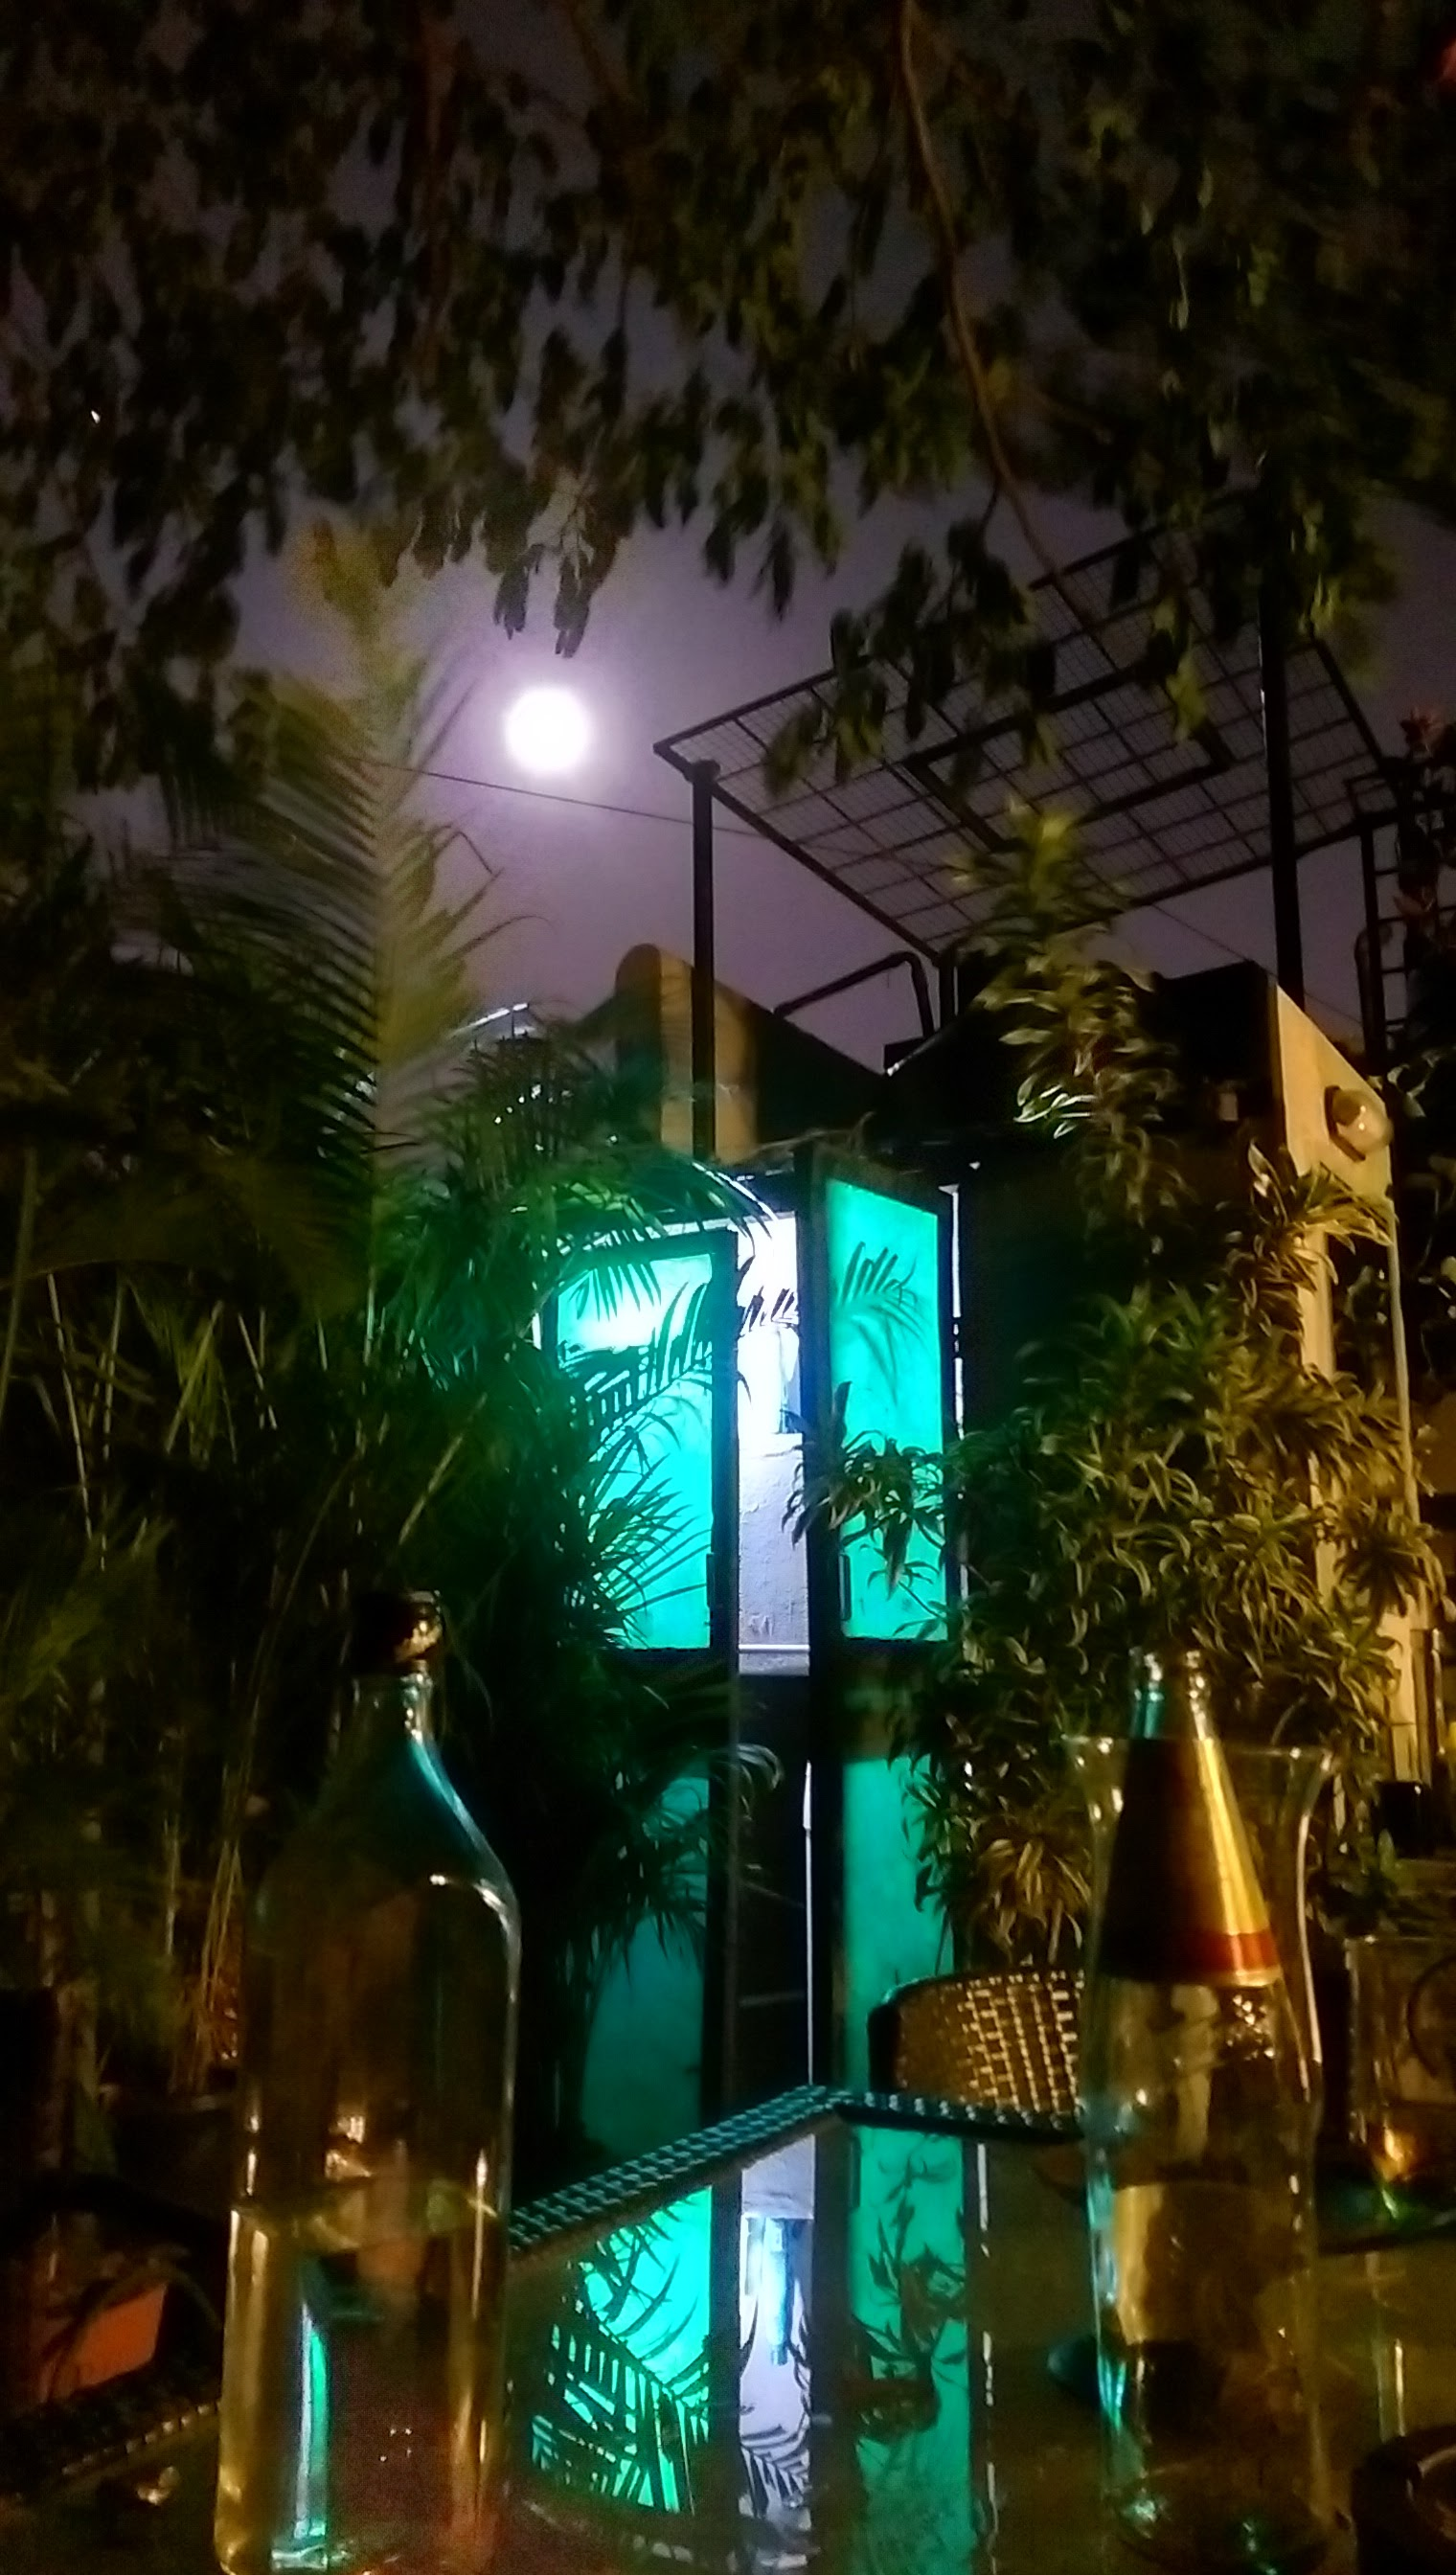 Moonlit Night on the terrace